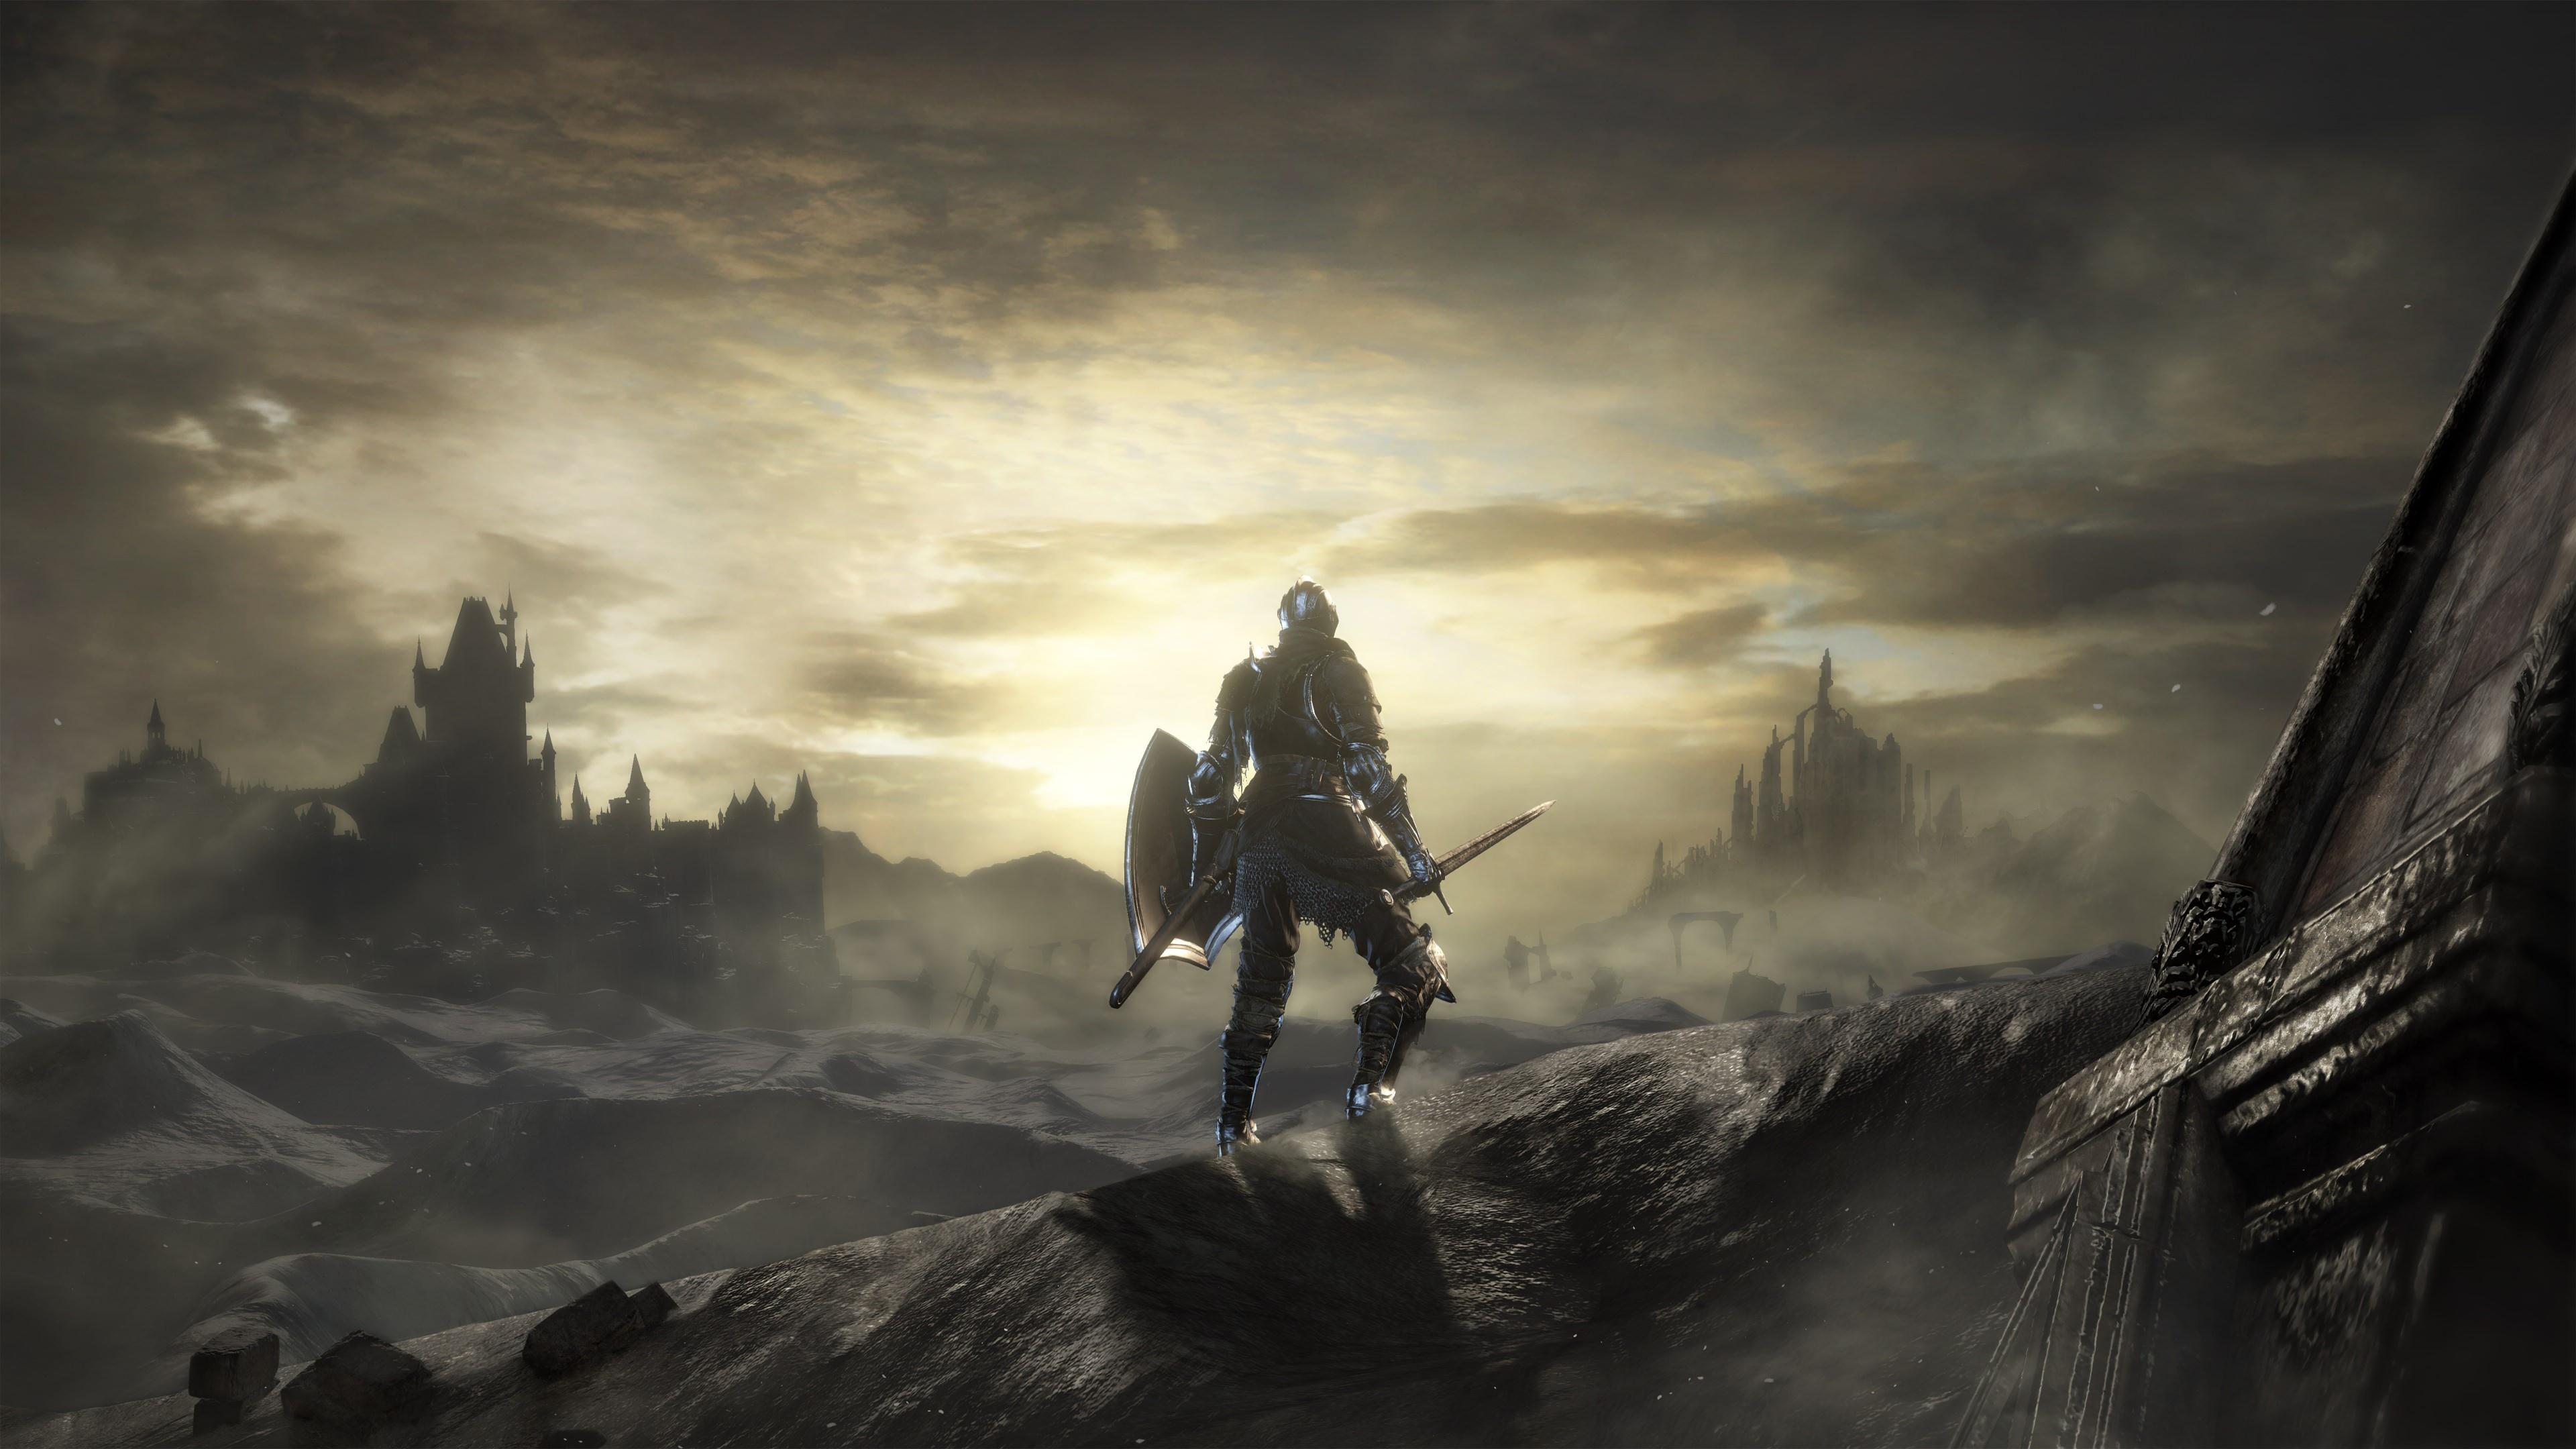 Armor Dark Souls Iii Knight Landscape Warrior 3840x2160